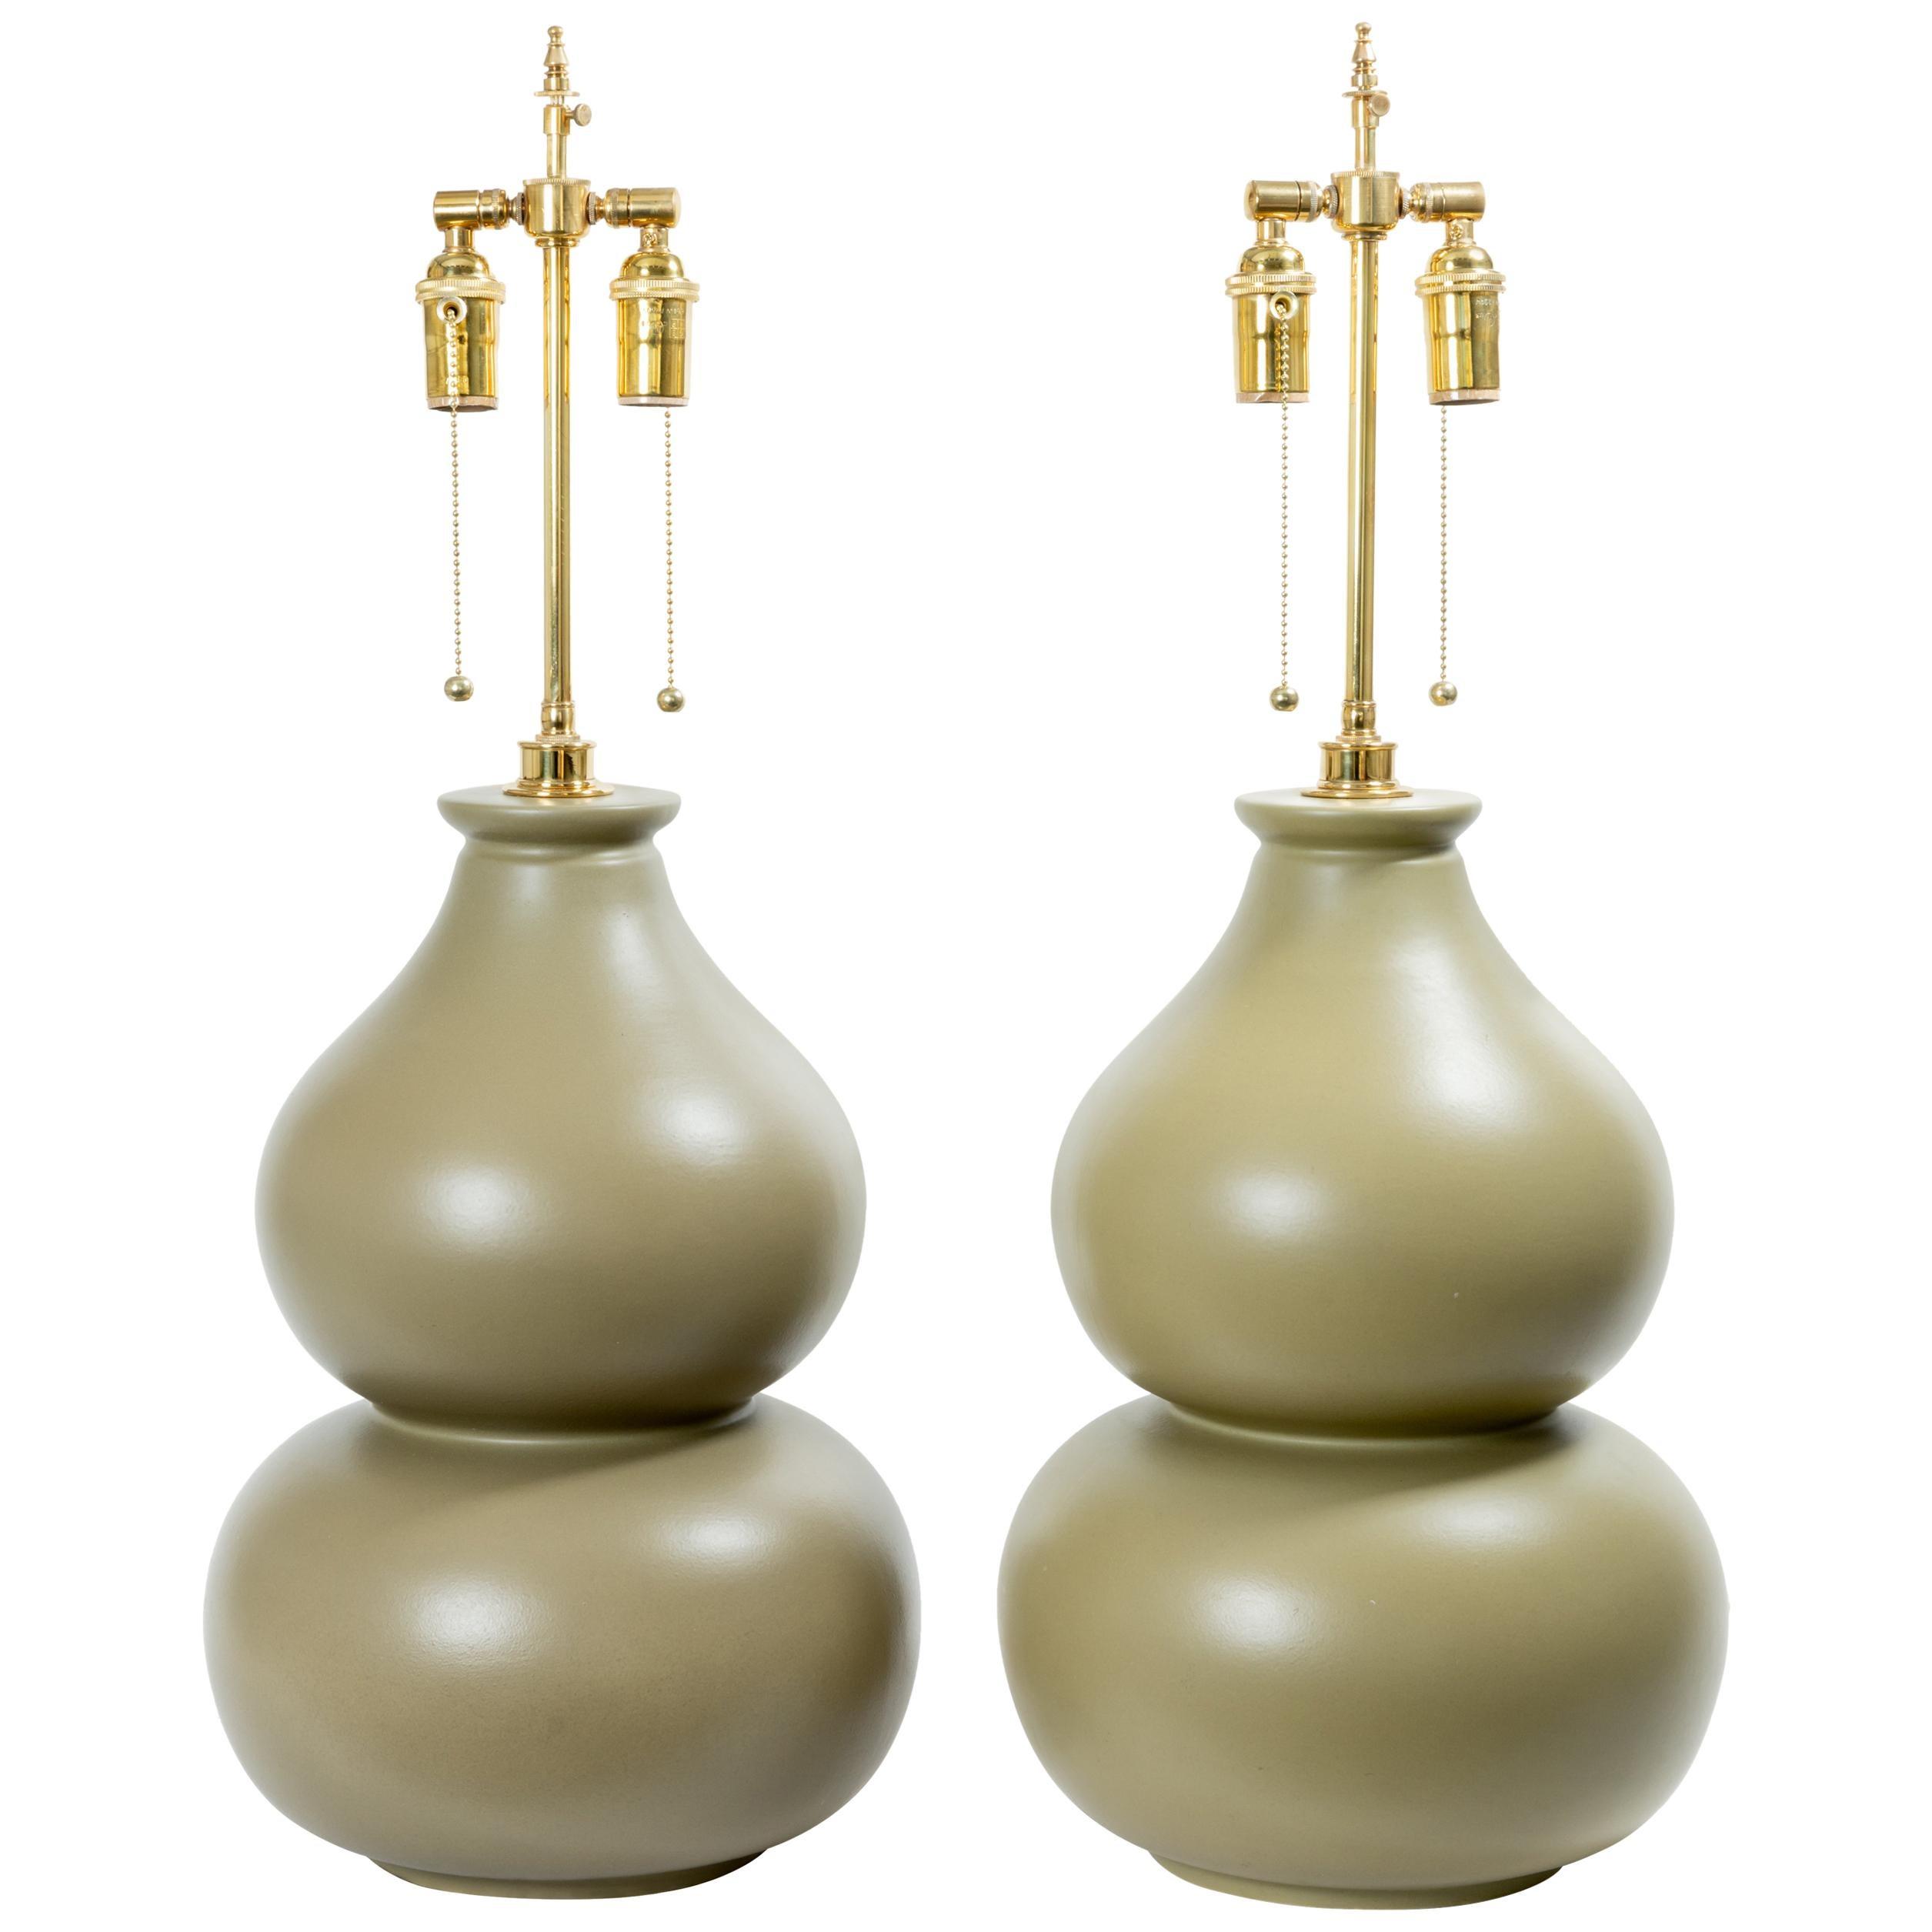 Pair of Bi-Color Gourd Form Ceramic Table Lamps